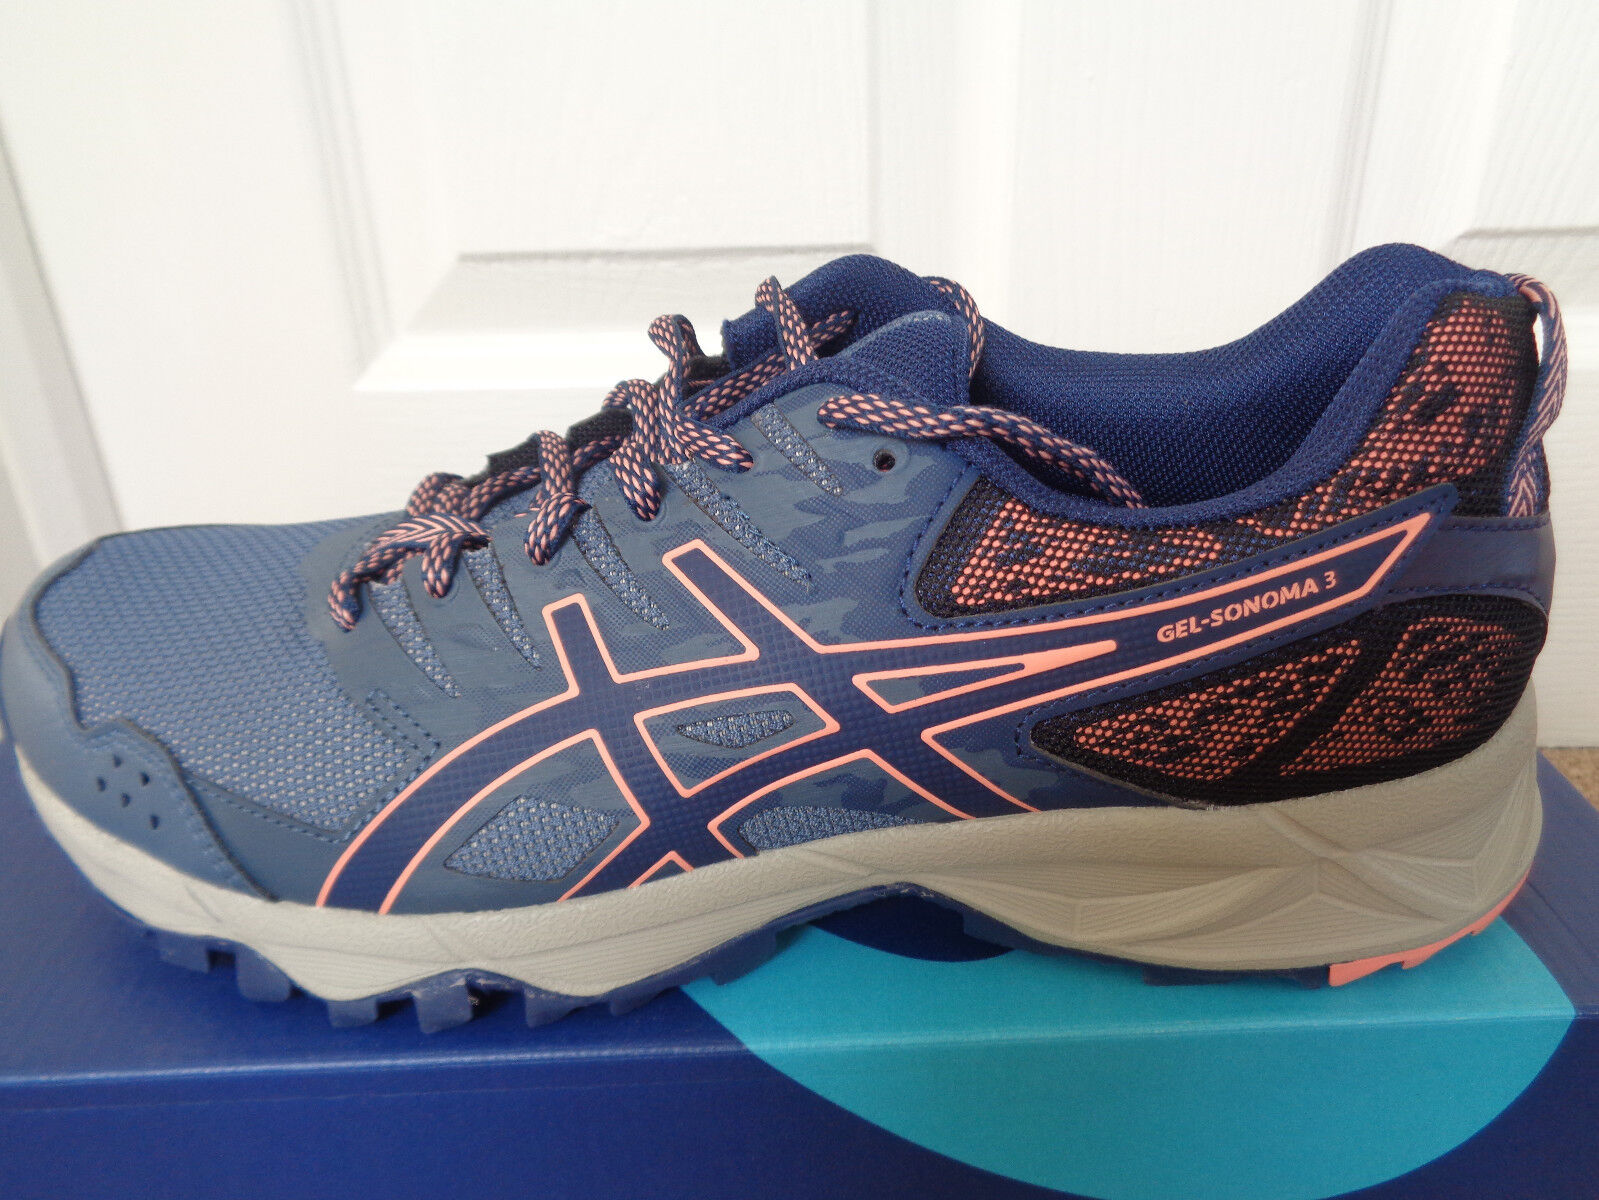 Asics Gel Sonoma 3 wmns trainers shoes T774N 5649 uk 7 eu 40.5 us 9 NEW+BOX